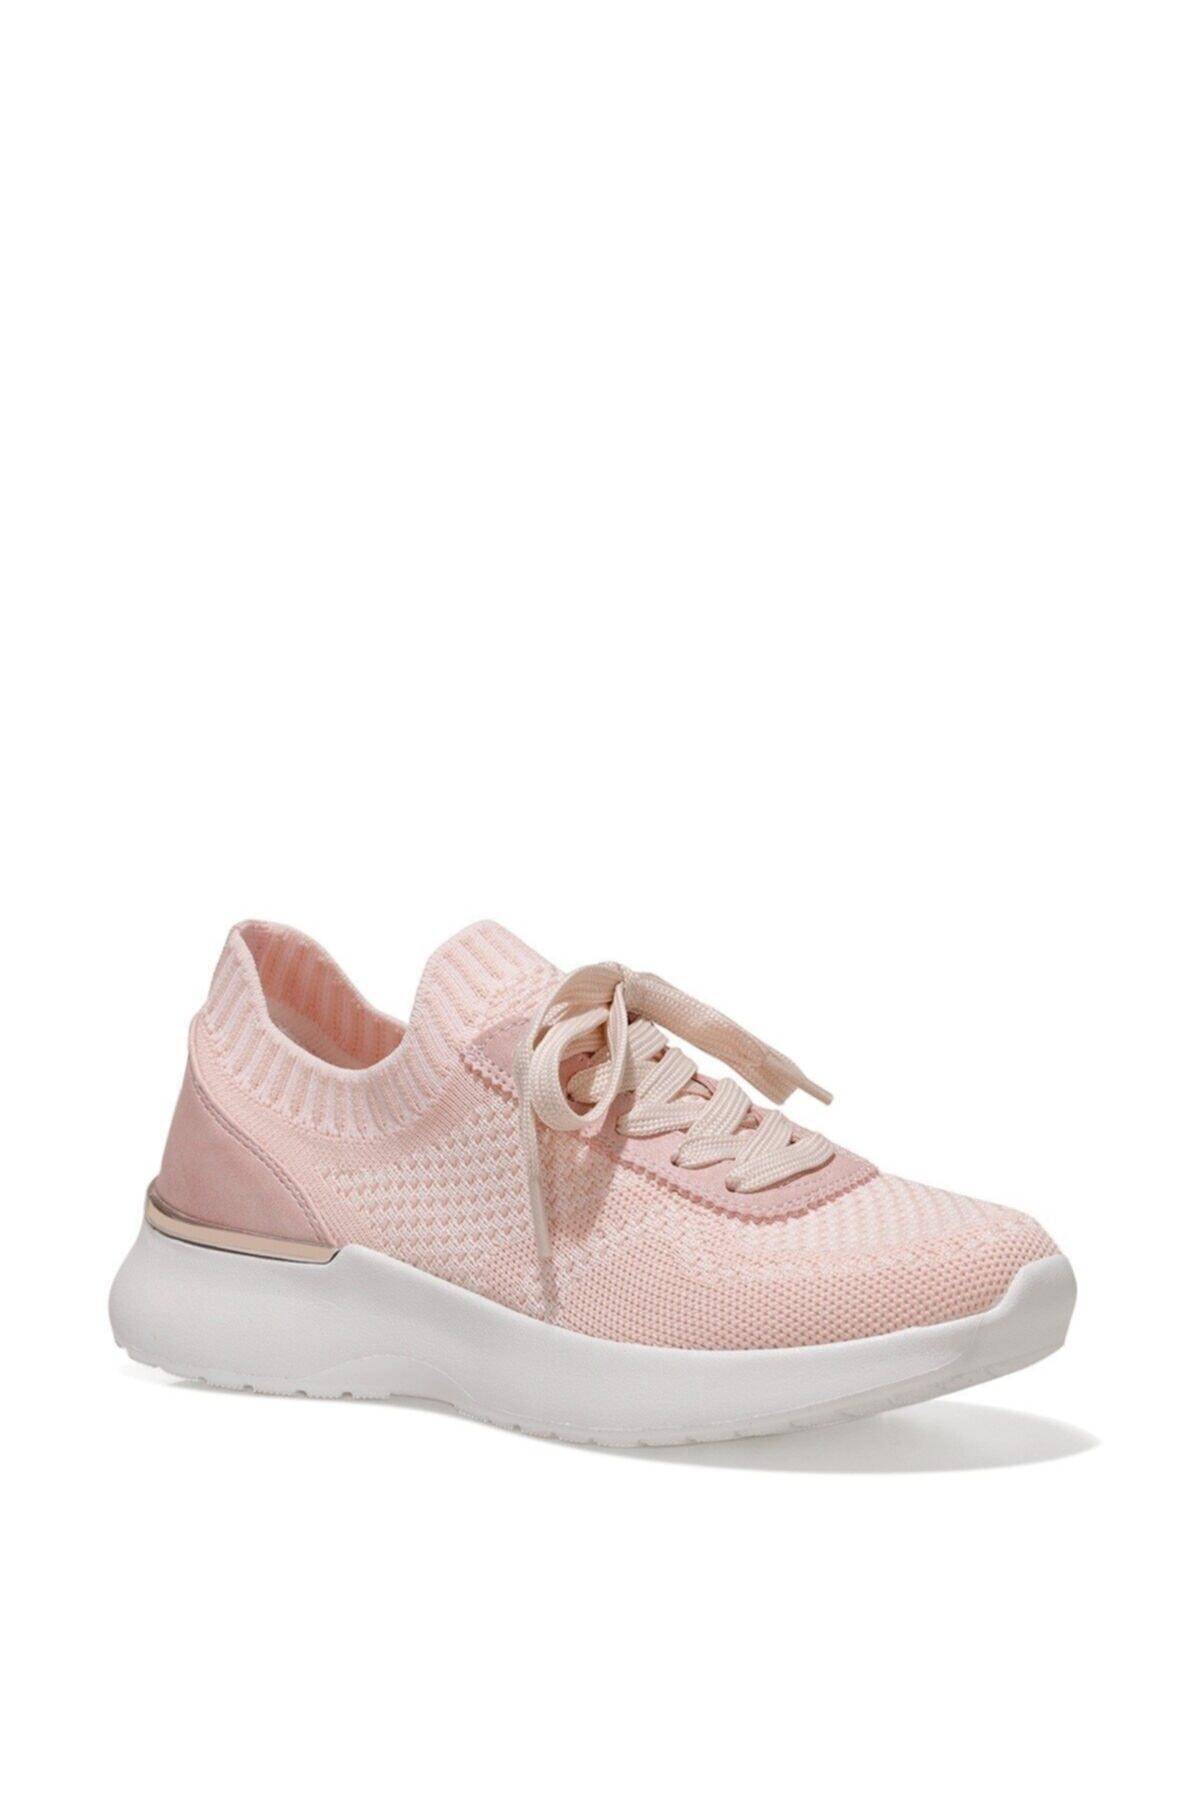 Nine West Mıesse 1fx Pembe Kadın Sneaker Ayakkabı 2